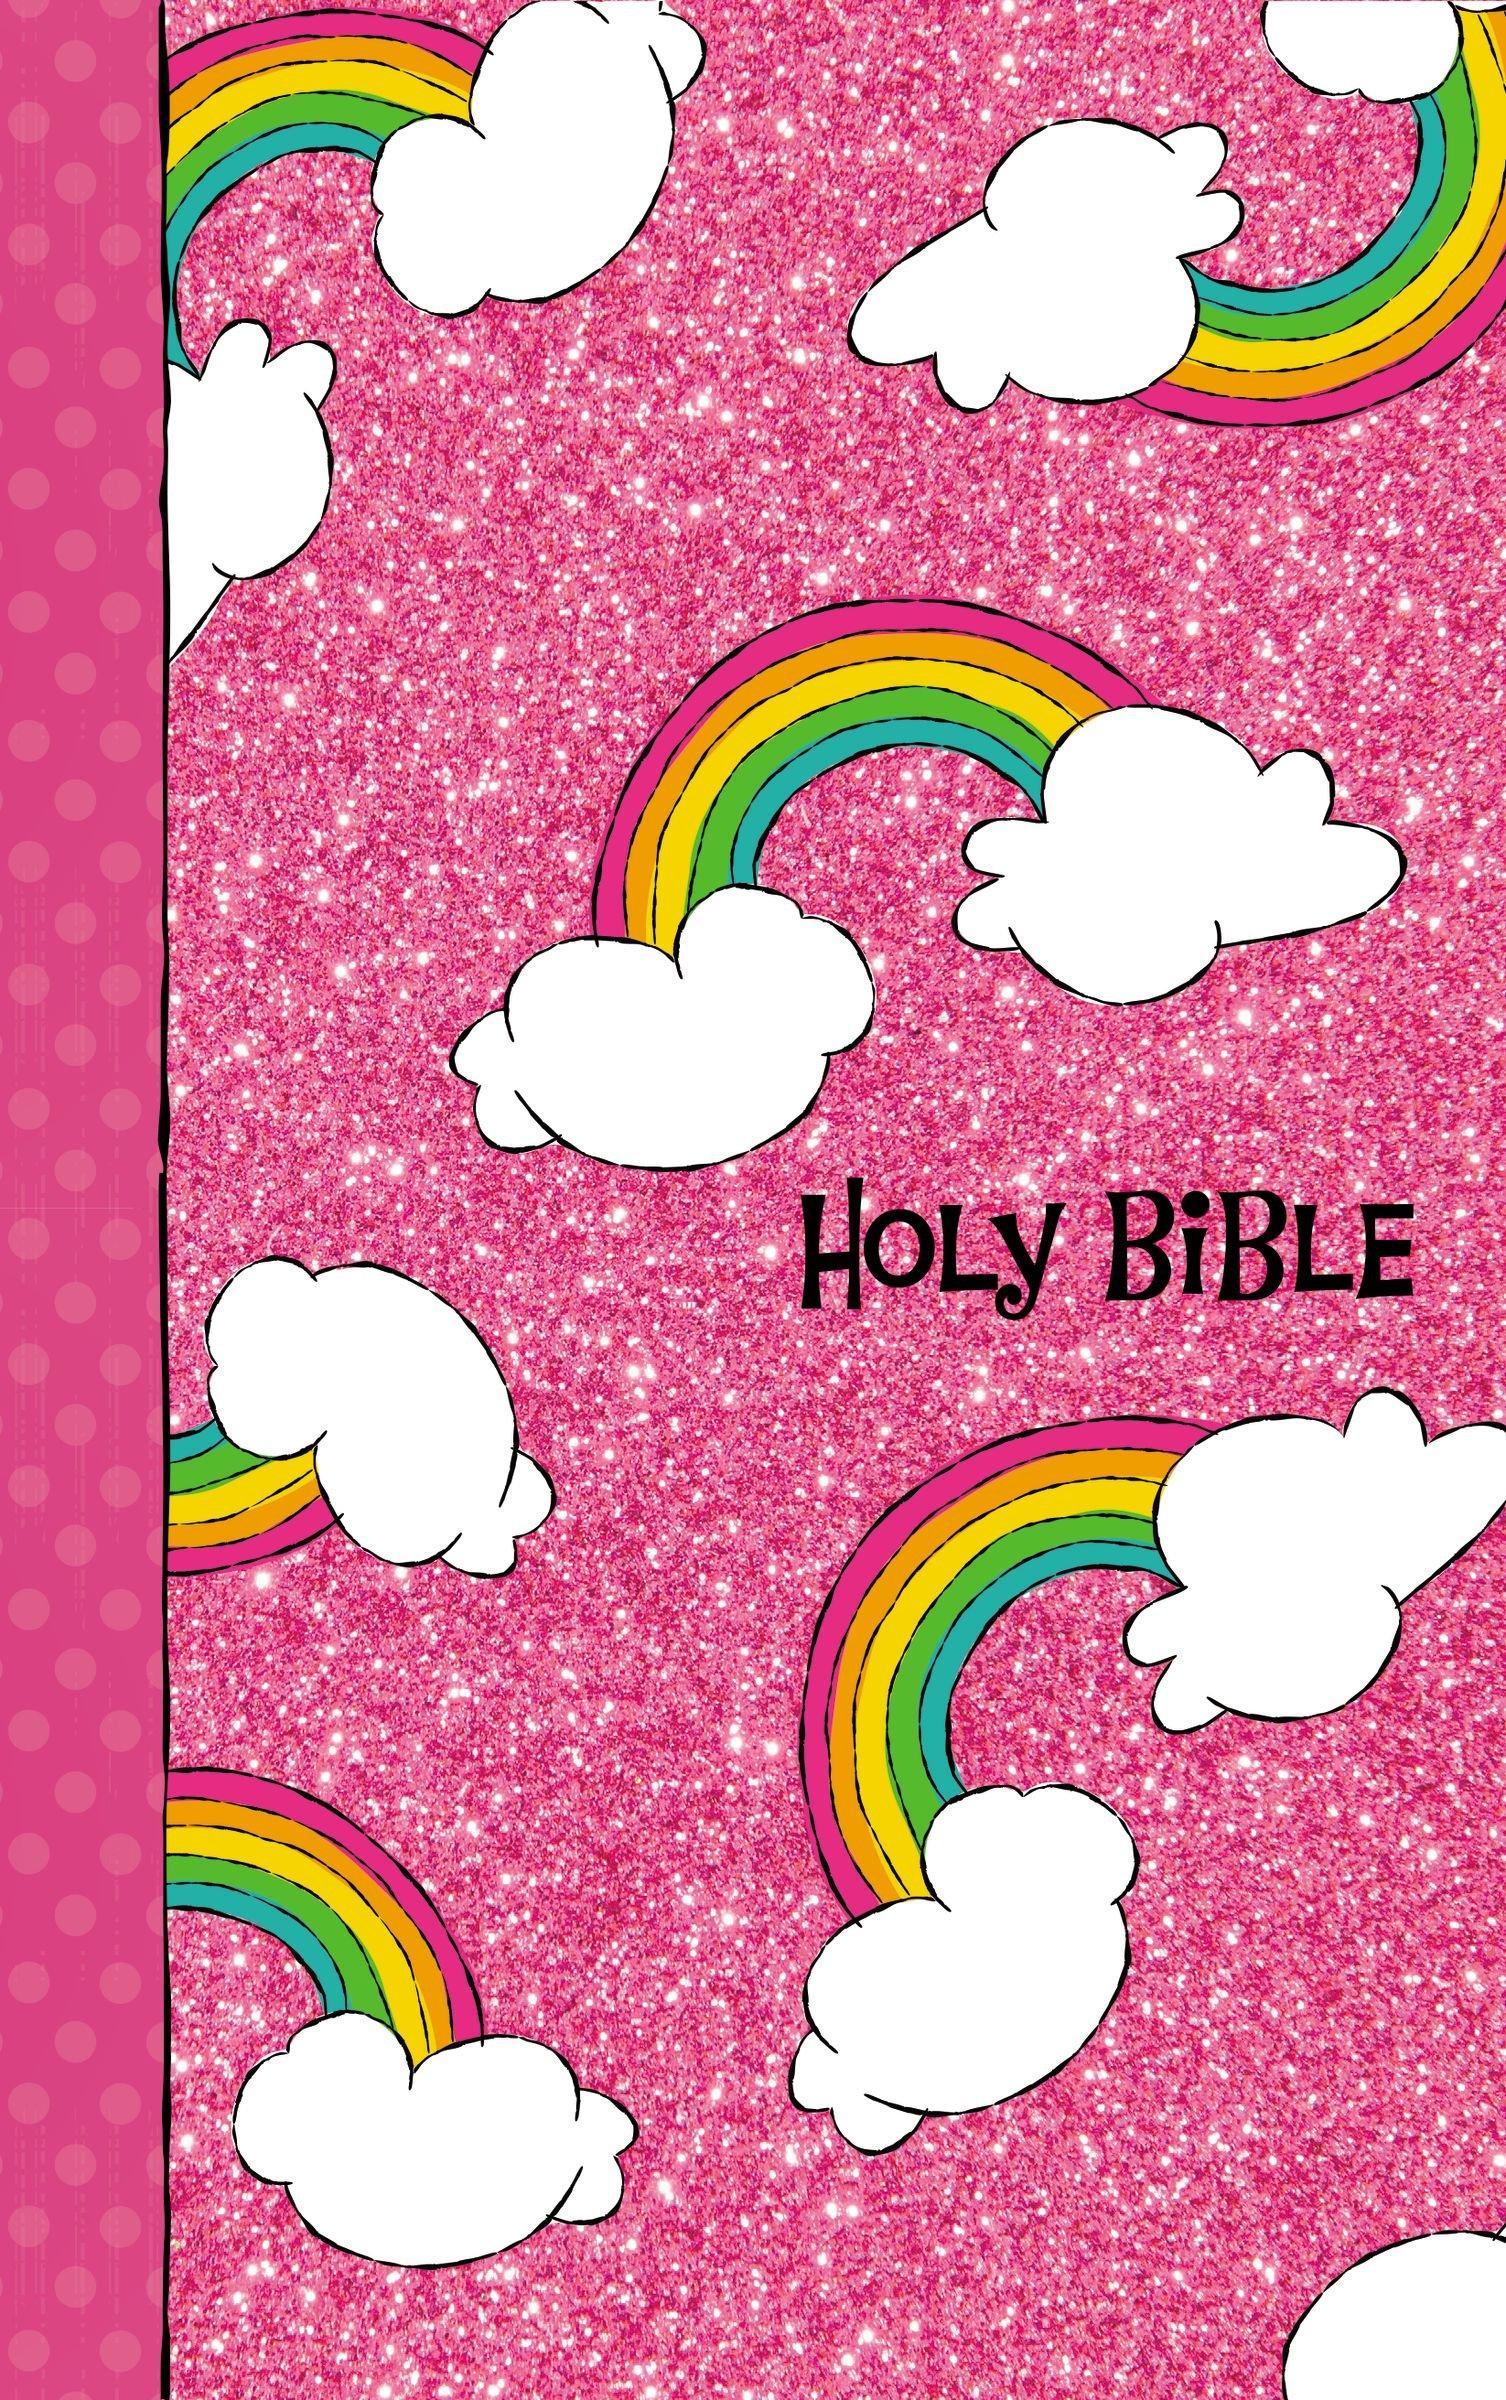 NIV God's Rainbow Holy Bible, Hardcover, Comfort Print